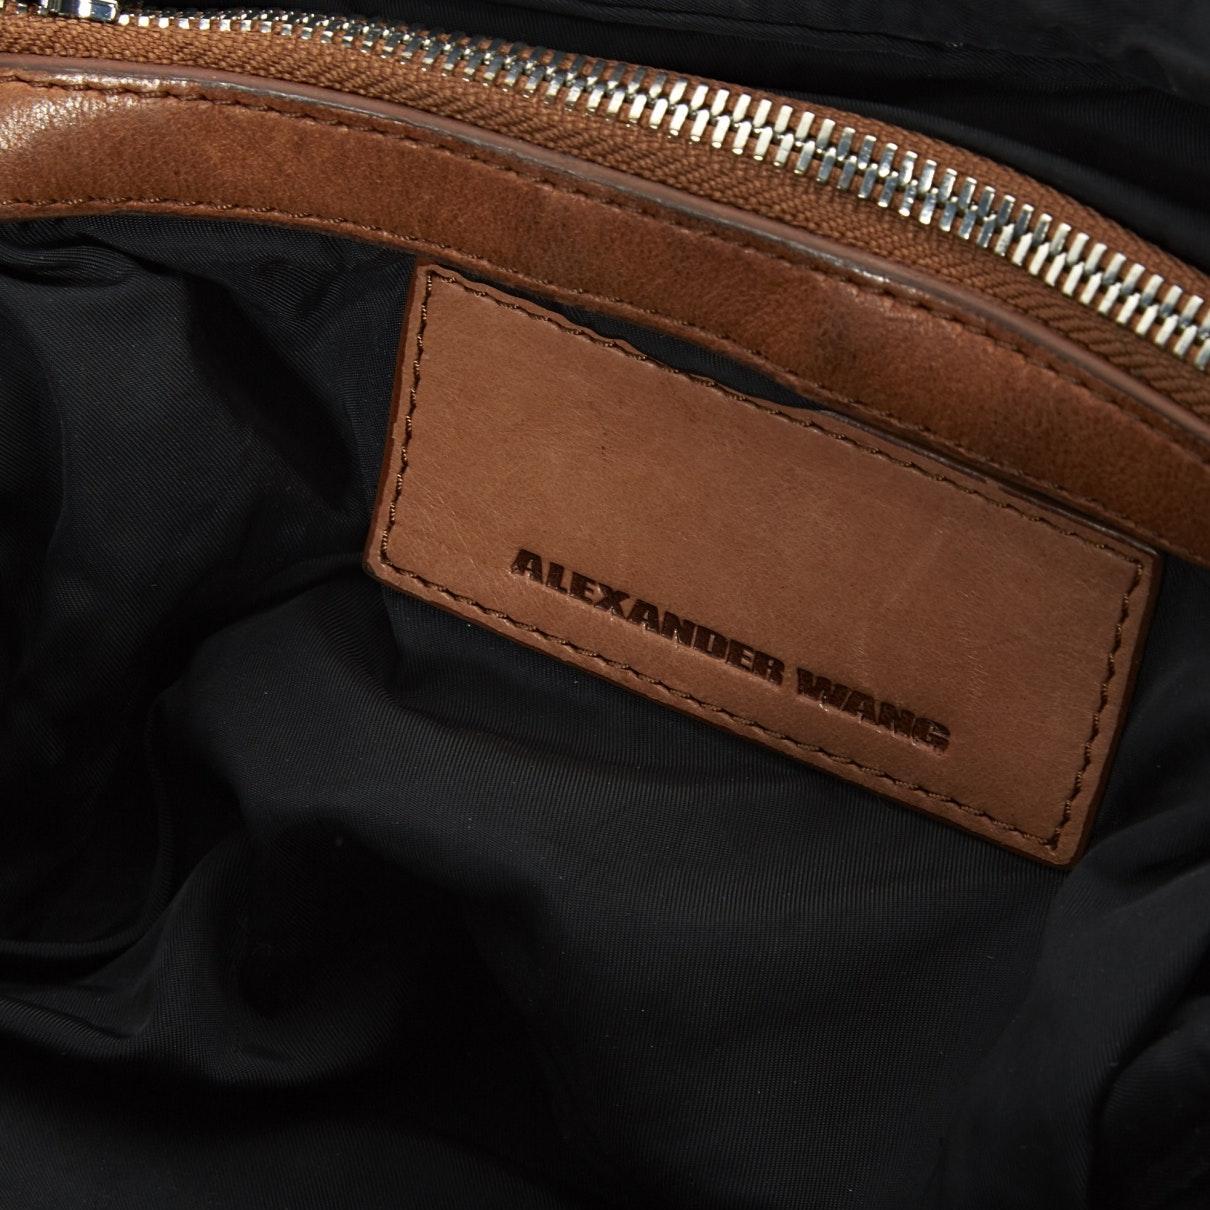 Alexander Wang Leder Brenda Leder handtaschen in Braun rwVfe